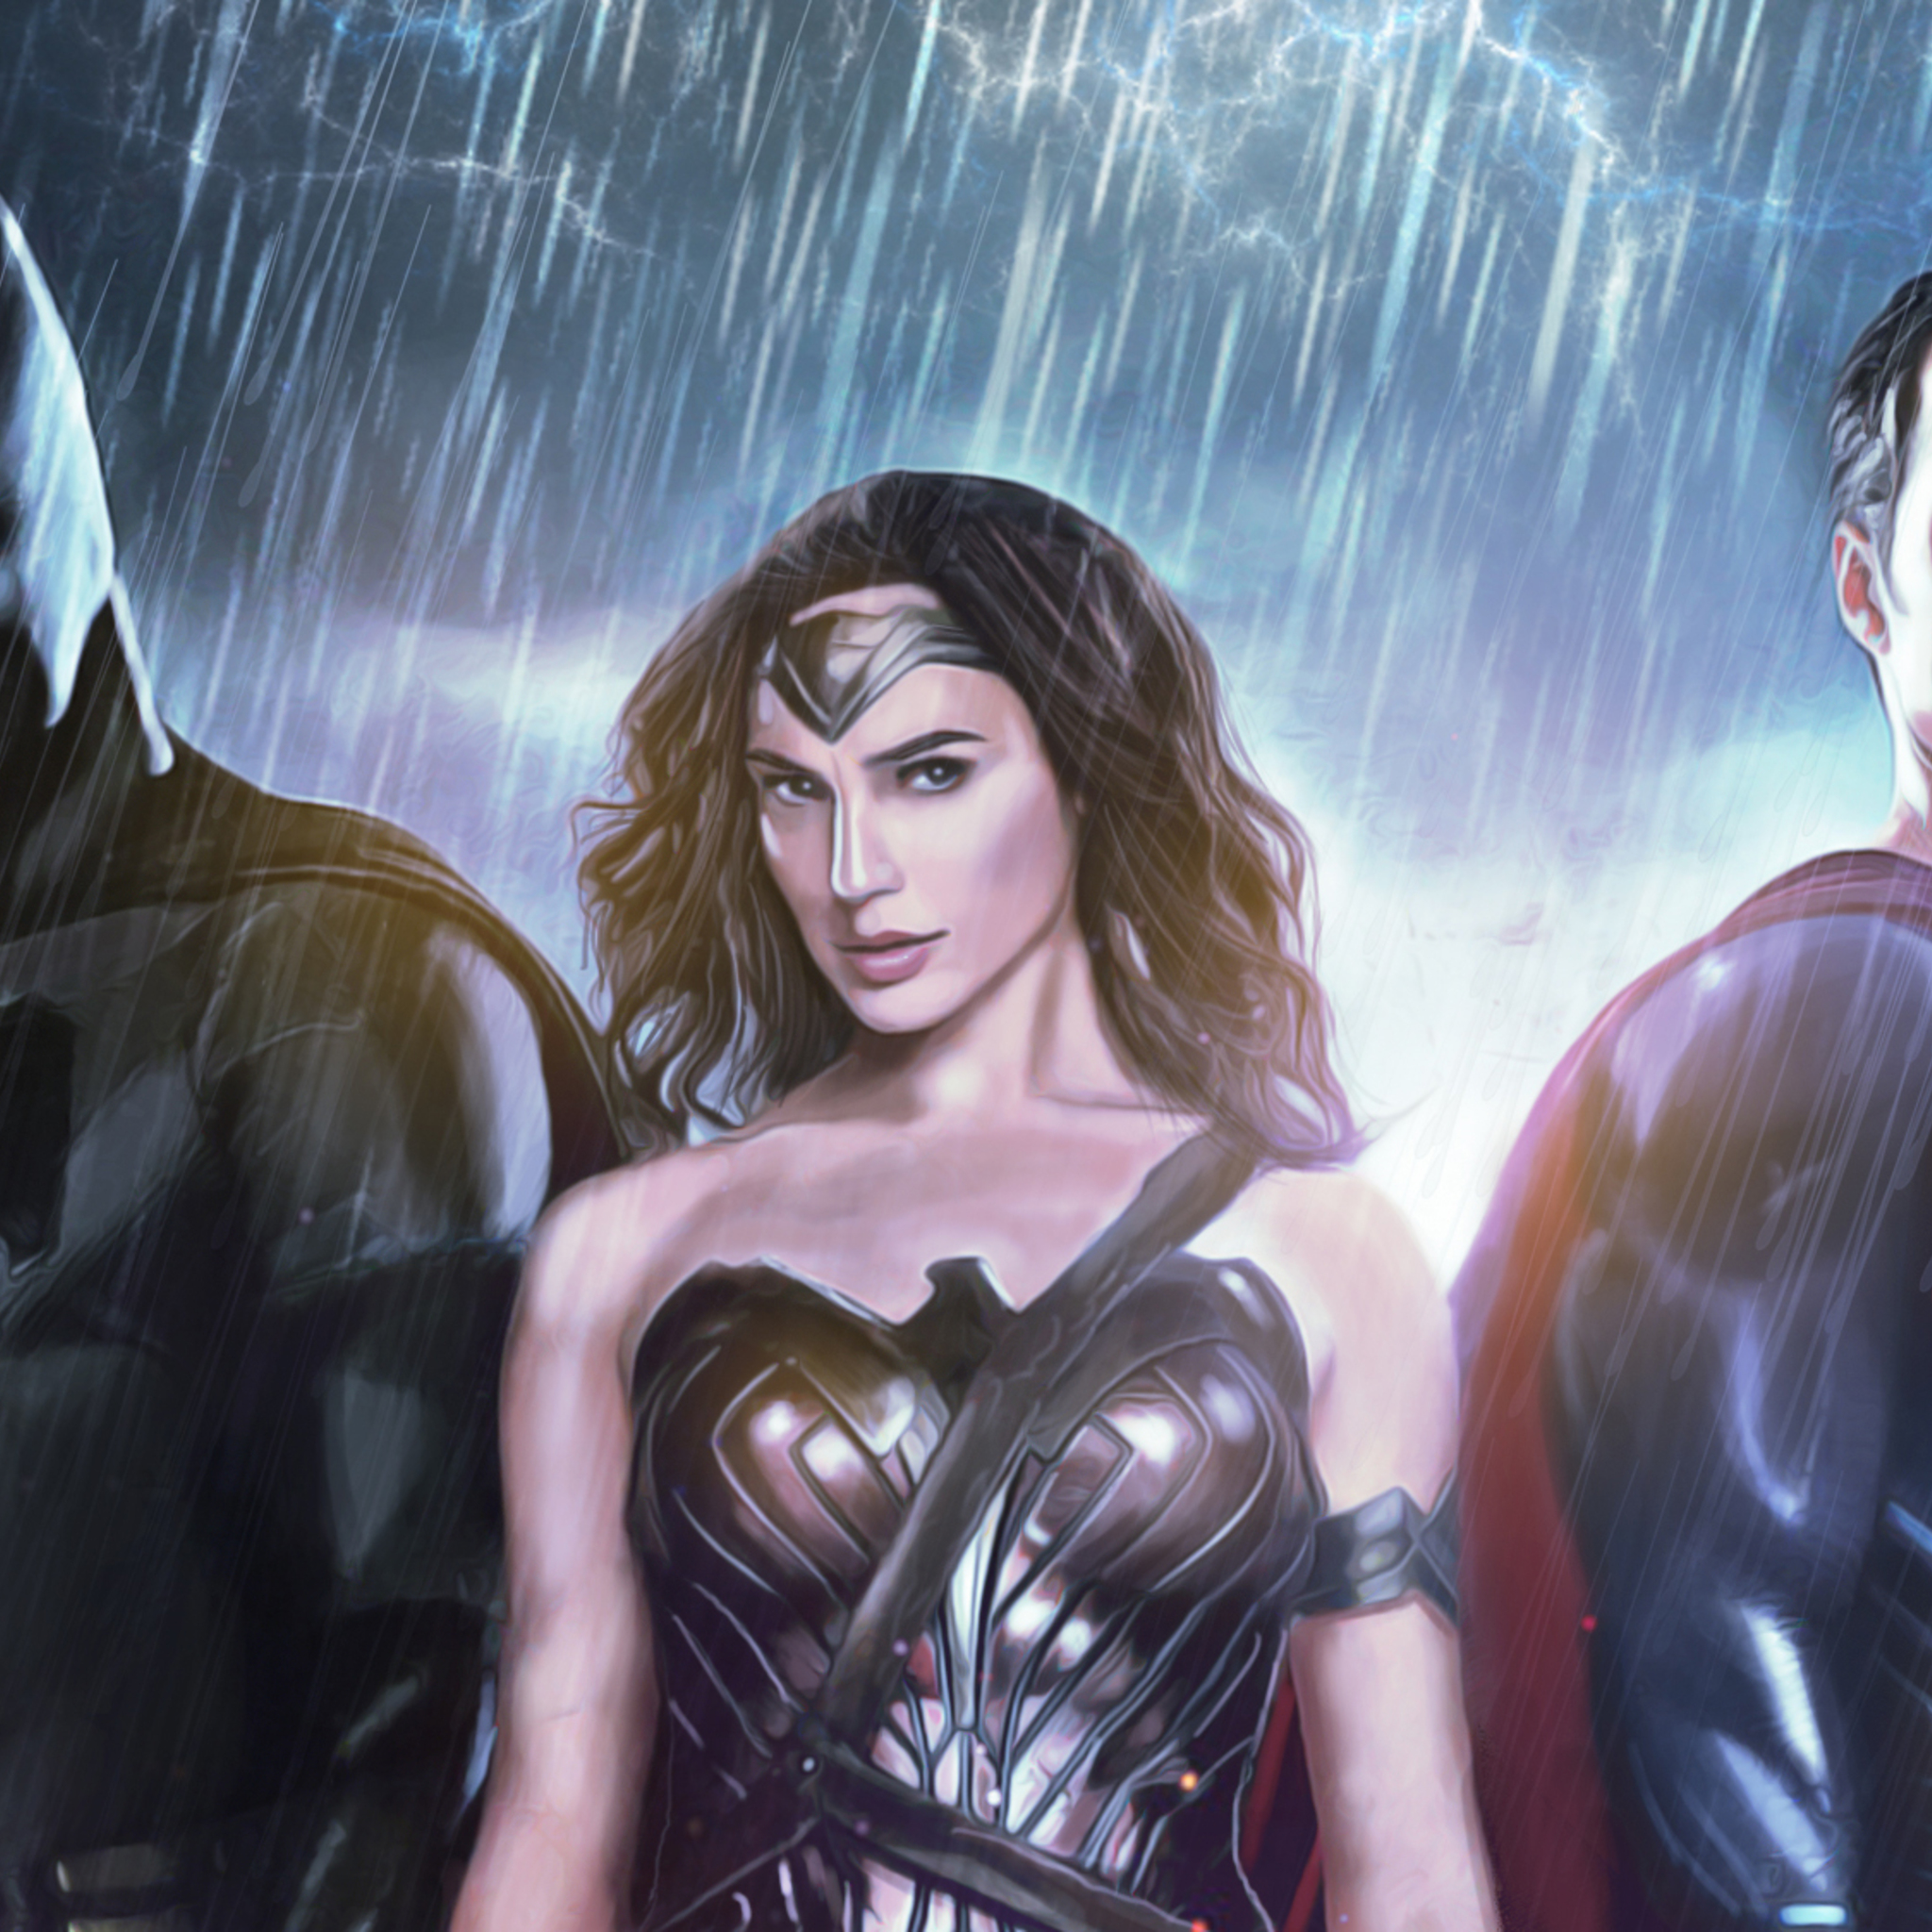 bat-man-wonder-woman-superman-d1.jpg